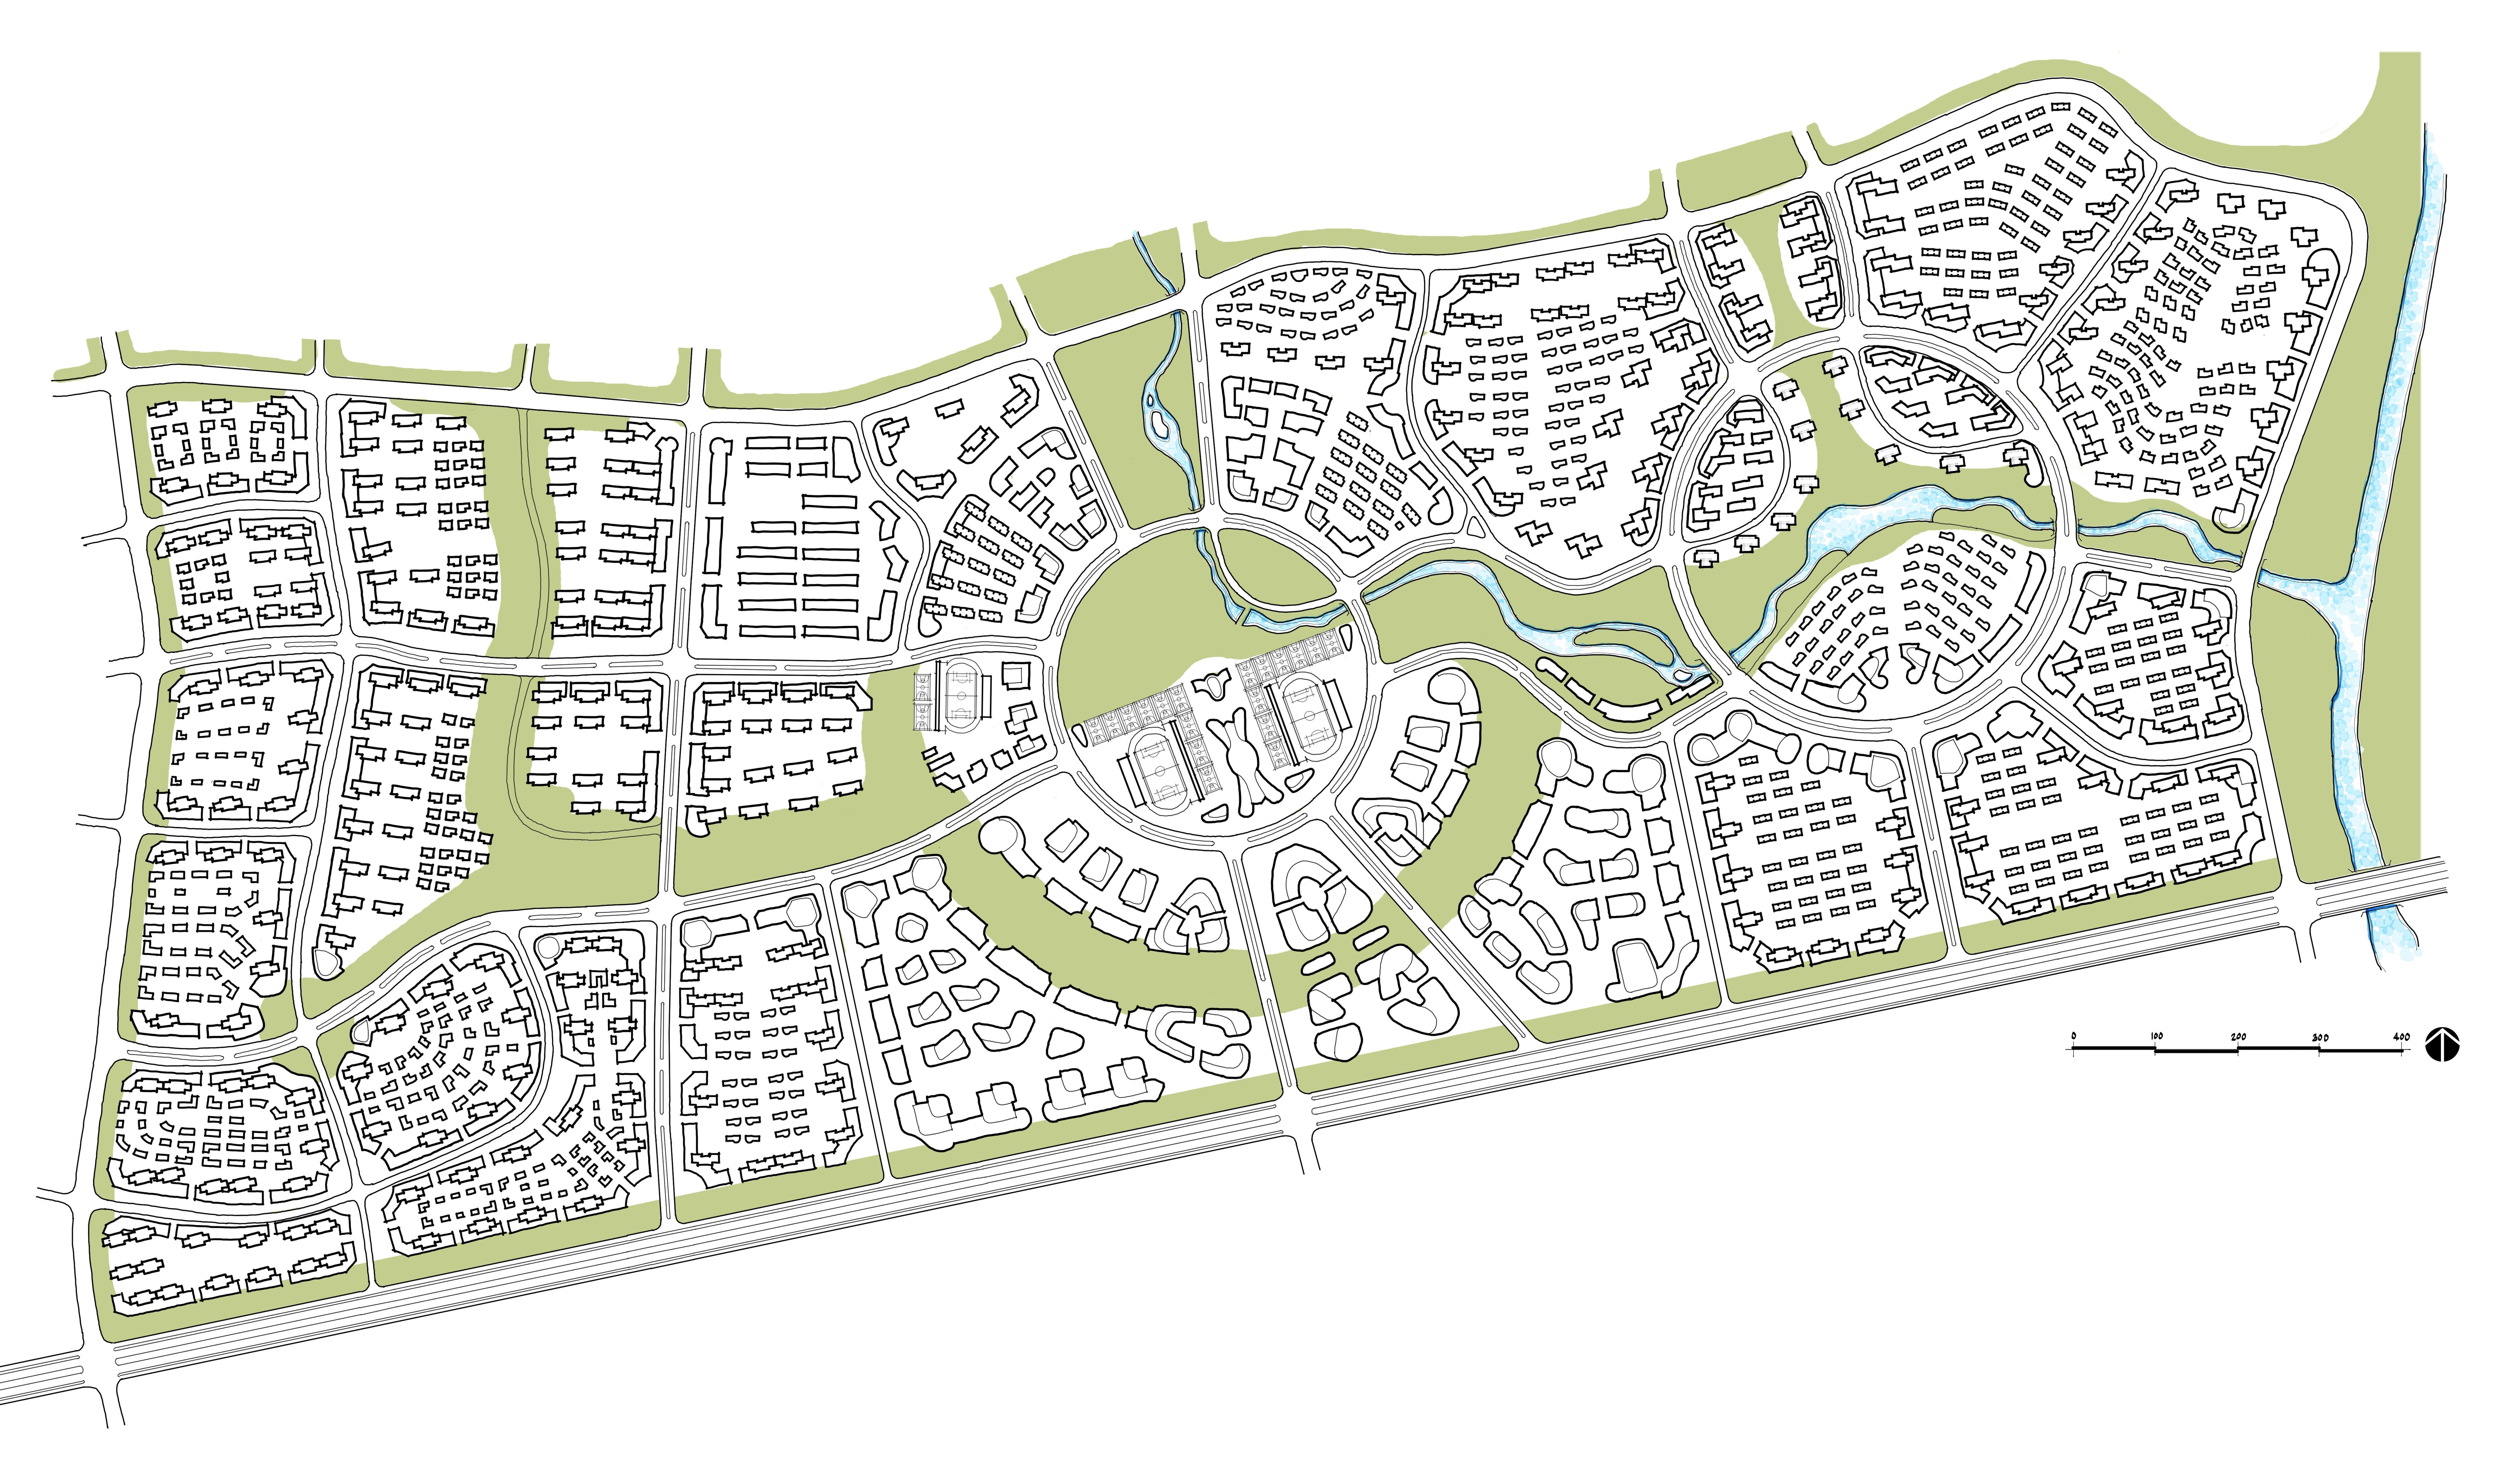 Urban Design Concept Green Connector School Master Plan Urban Design Concept Urban Design Urban Design Graphics